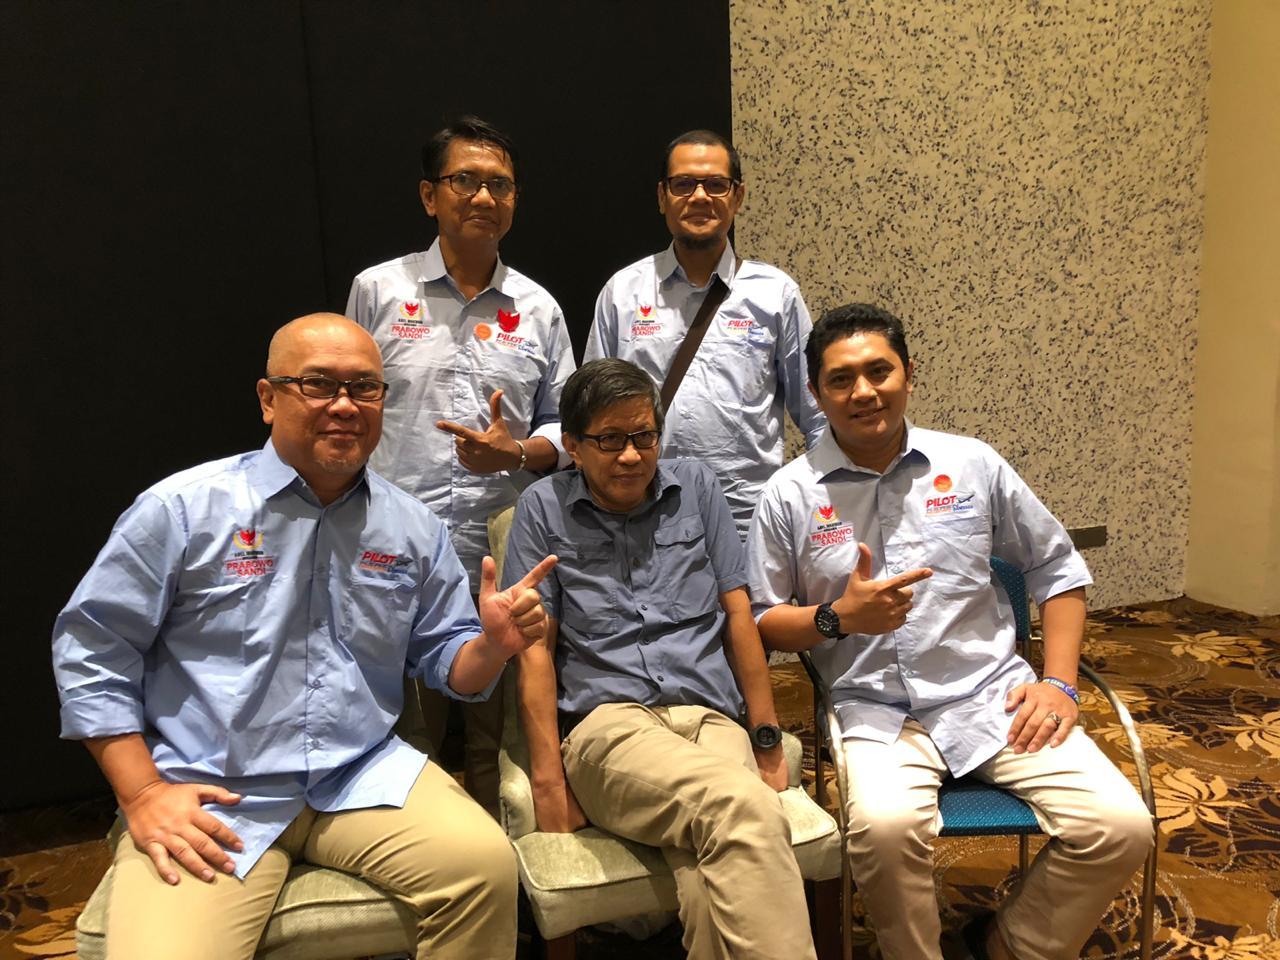 Relawan Prabowo-Sandi Hadirkan Rocky Gerung di Malaysia